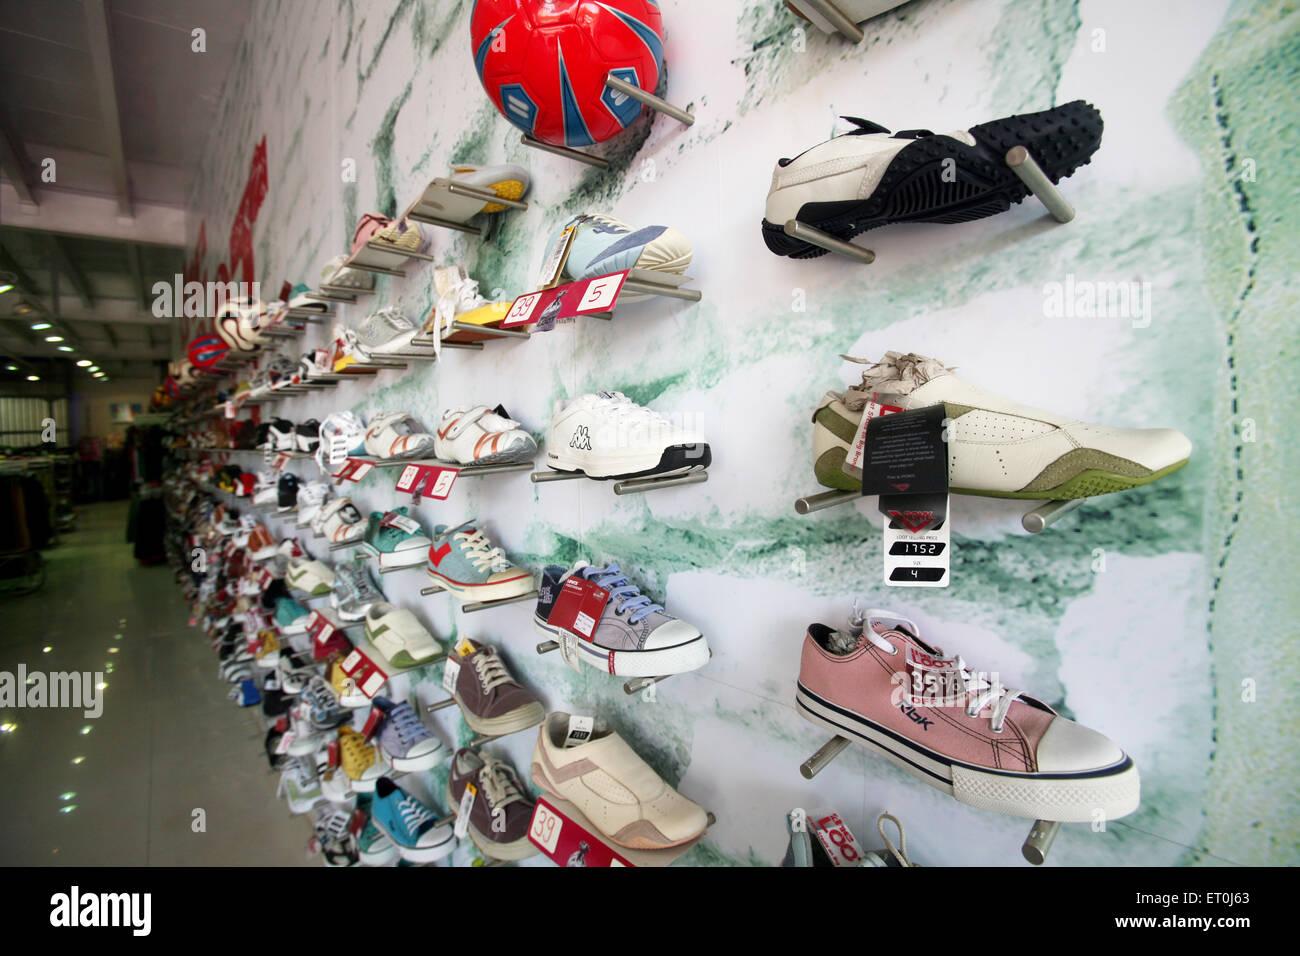 Shoes on display at Loot store located in Andheri ; Bombay Mumbai ; Maharashtra ; India - Stock Image